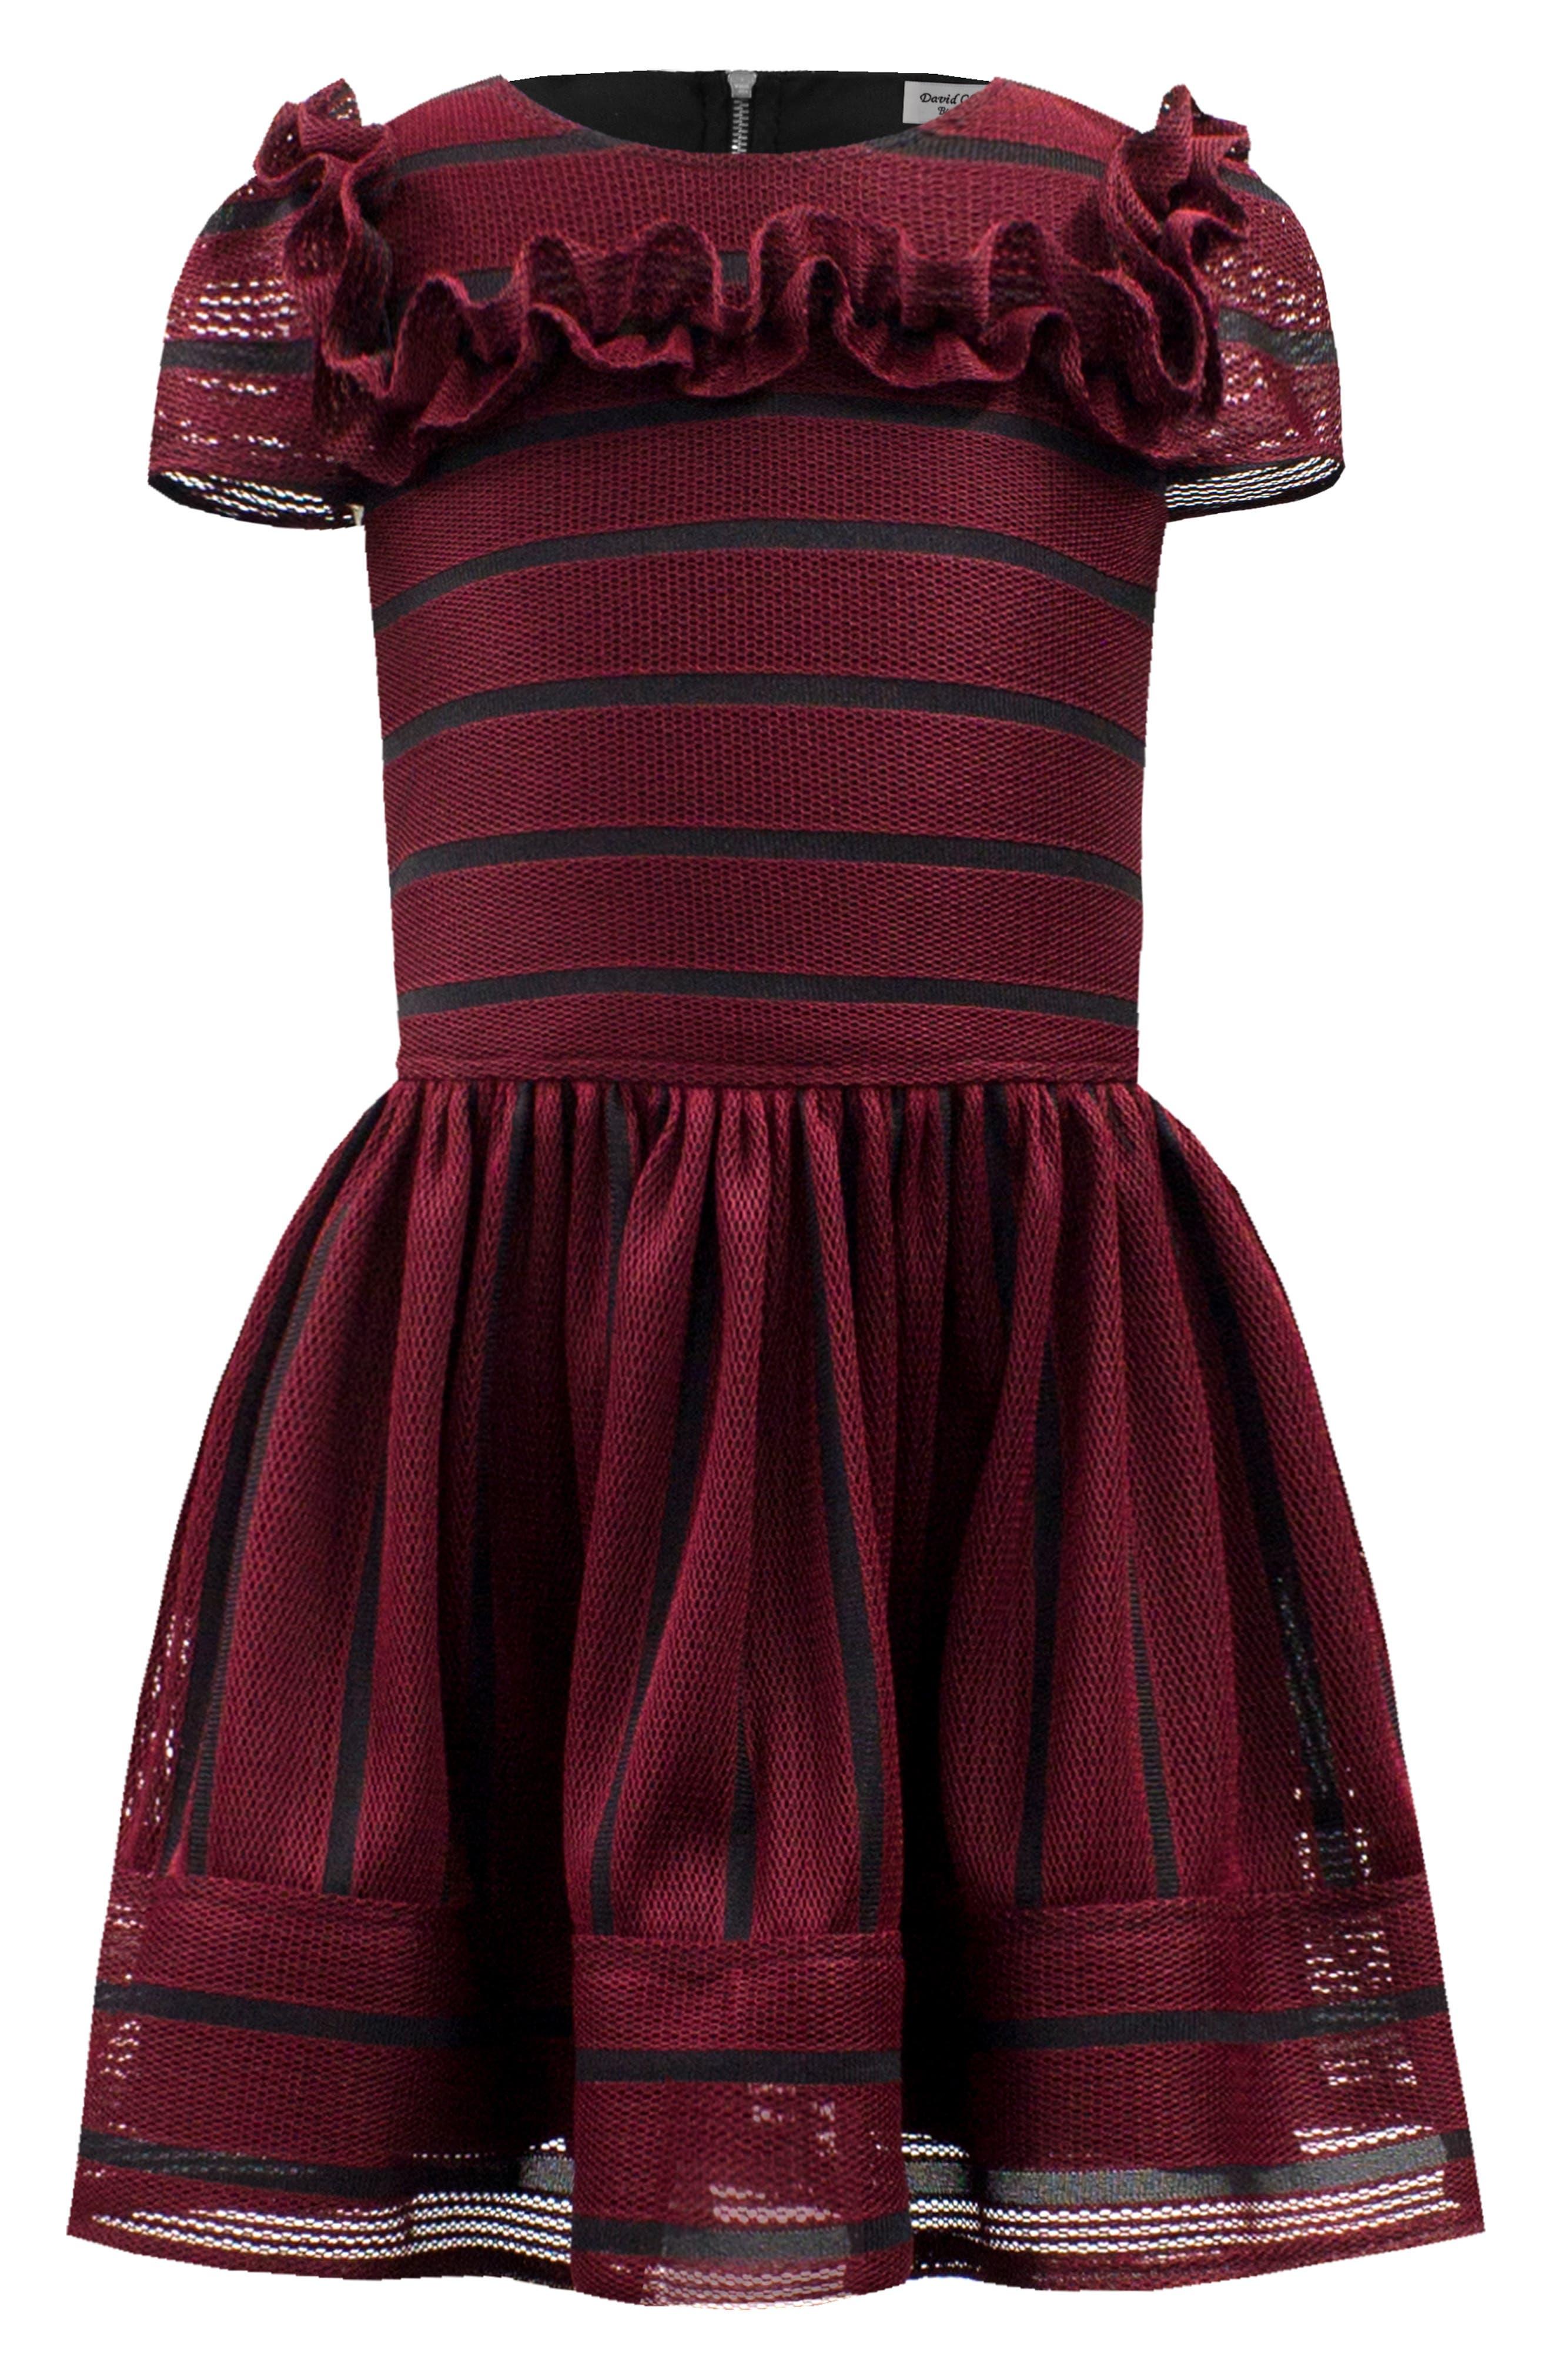 DAVID CHARLES Stripe Techno Frill Fit & Flare Dress, Main, color, WINE